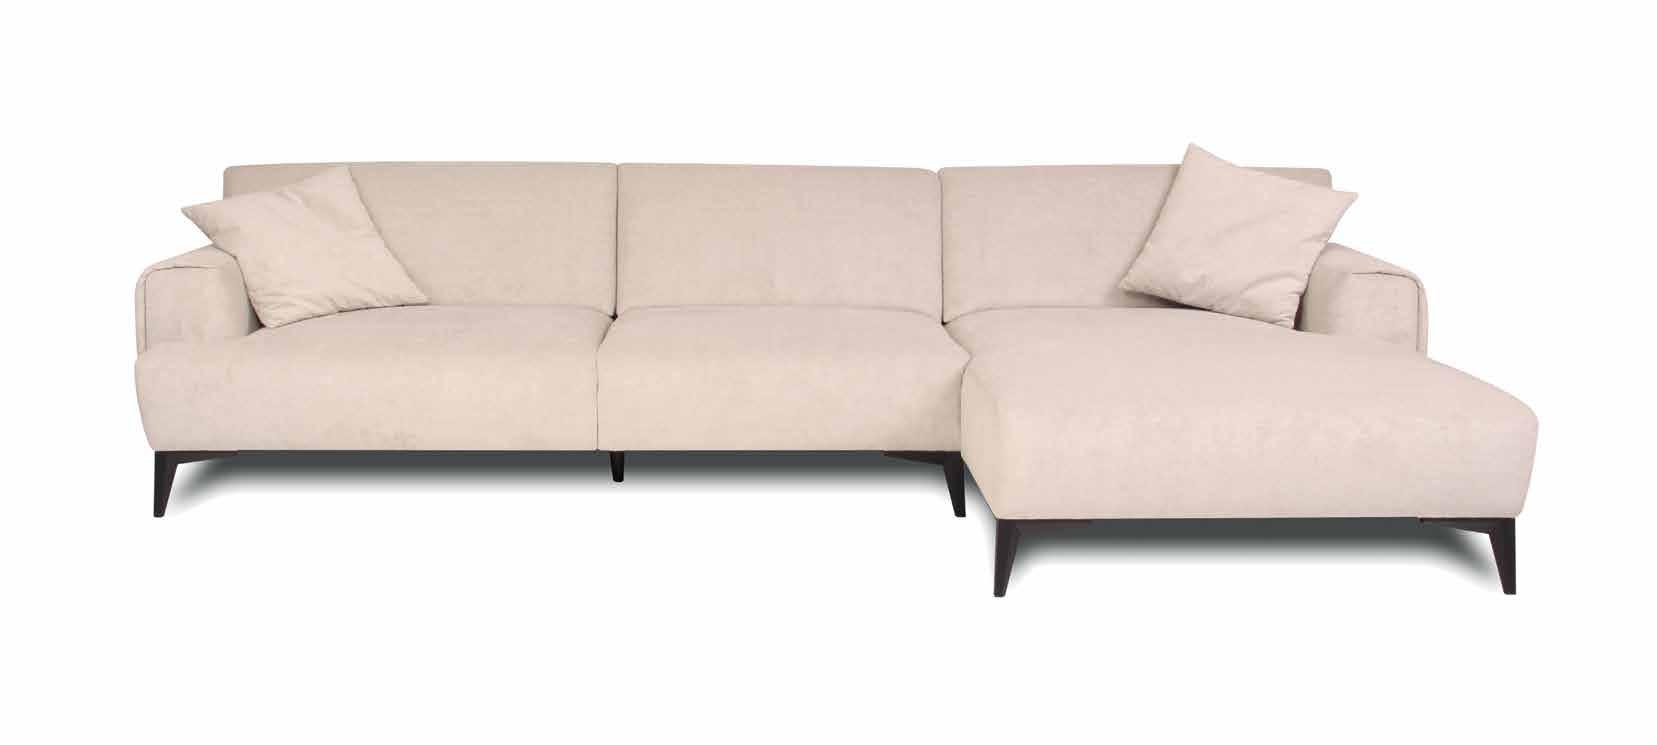 Ъглов диван Serena - арт мебели естествено дърво